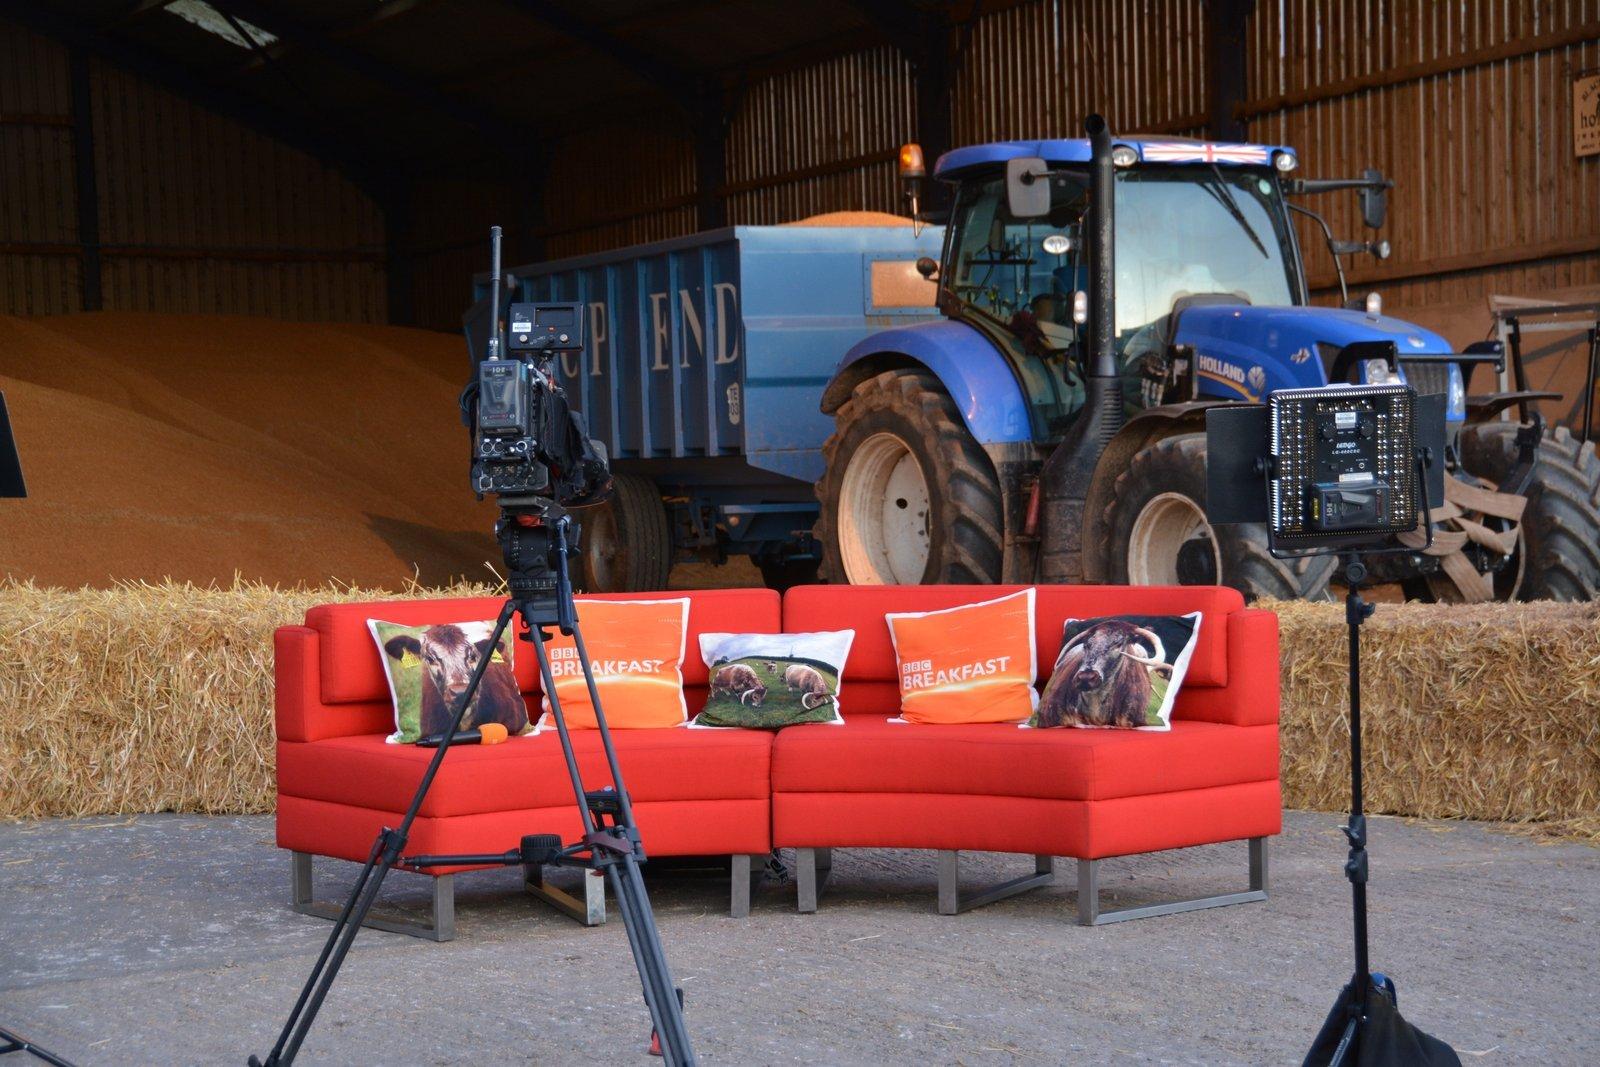 BBC Breakfast Hosting At Blackbrook Farm